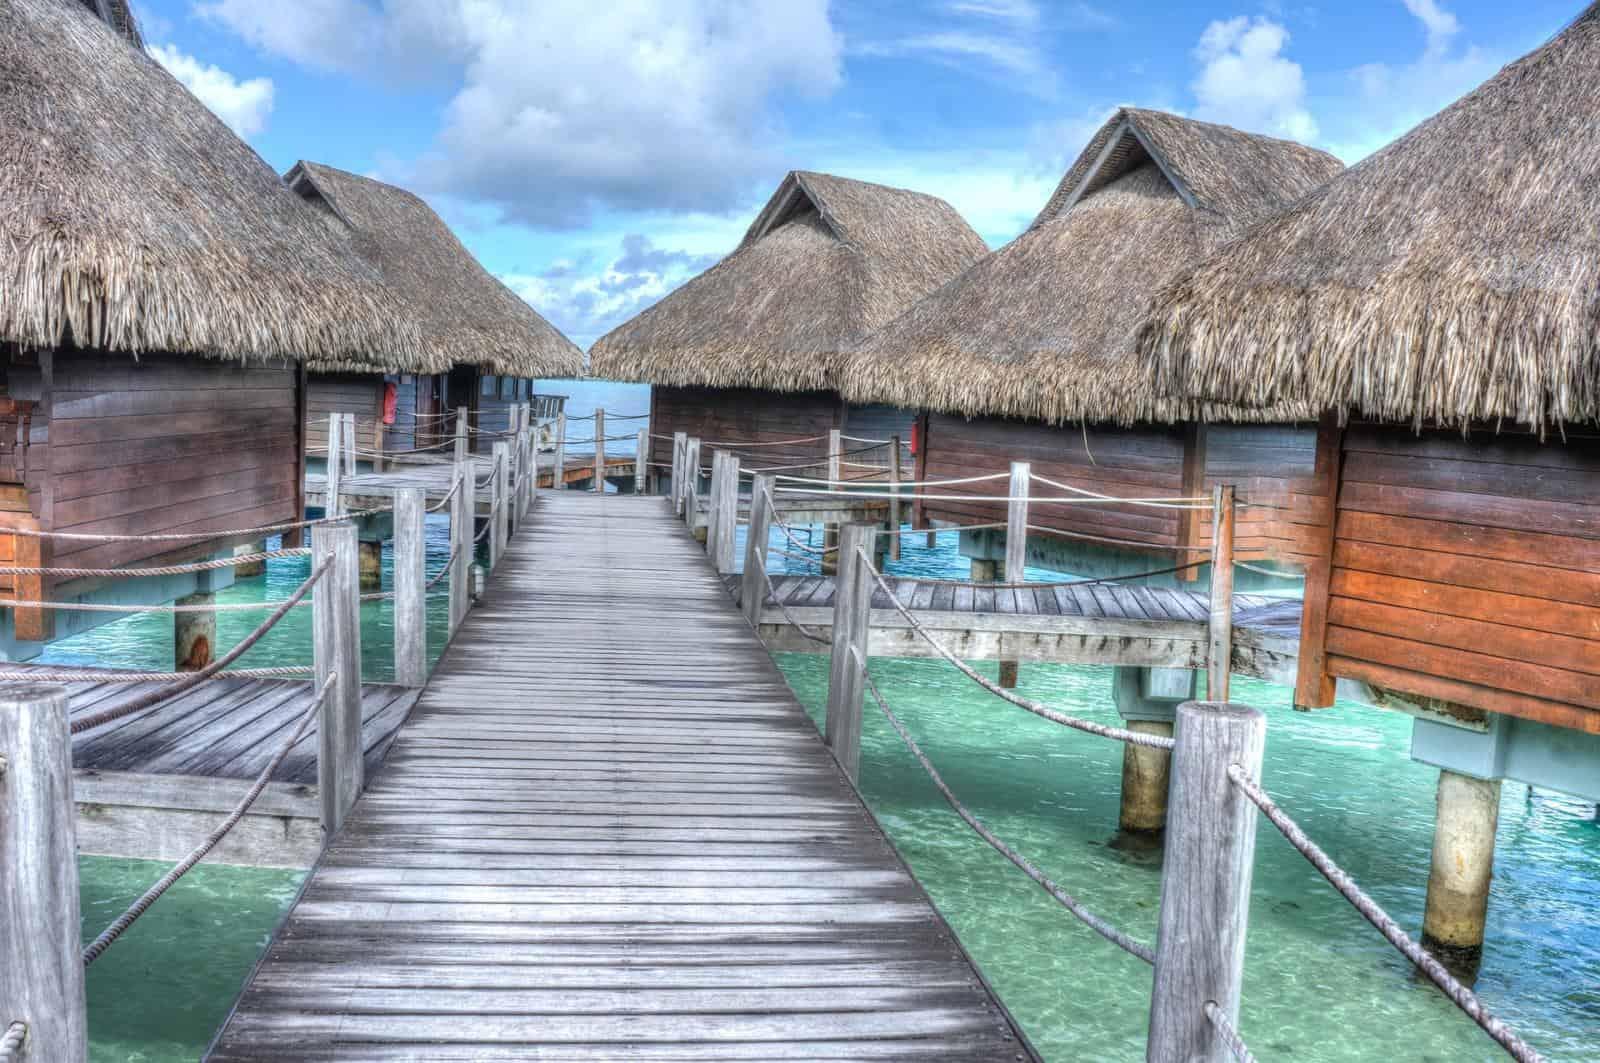 Where to Stay on Bora bora with family